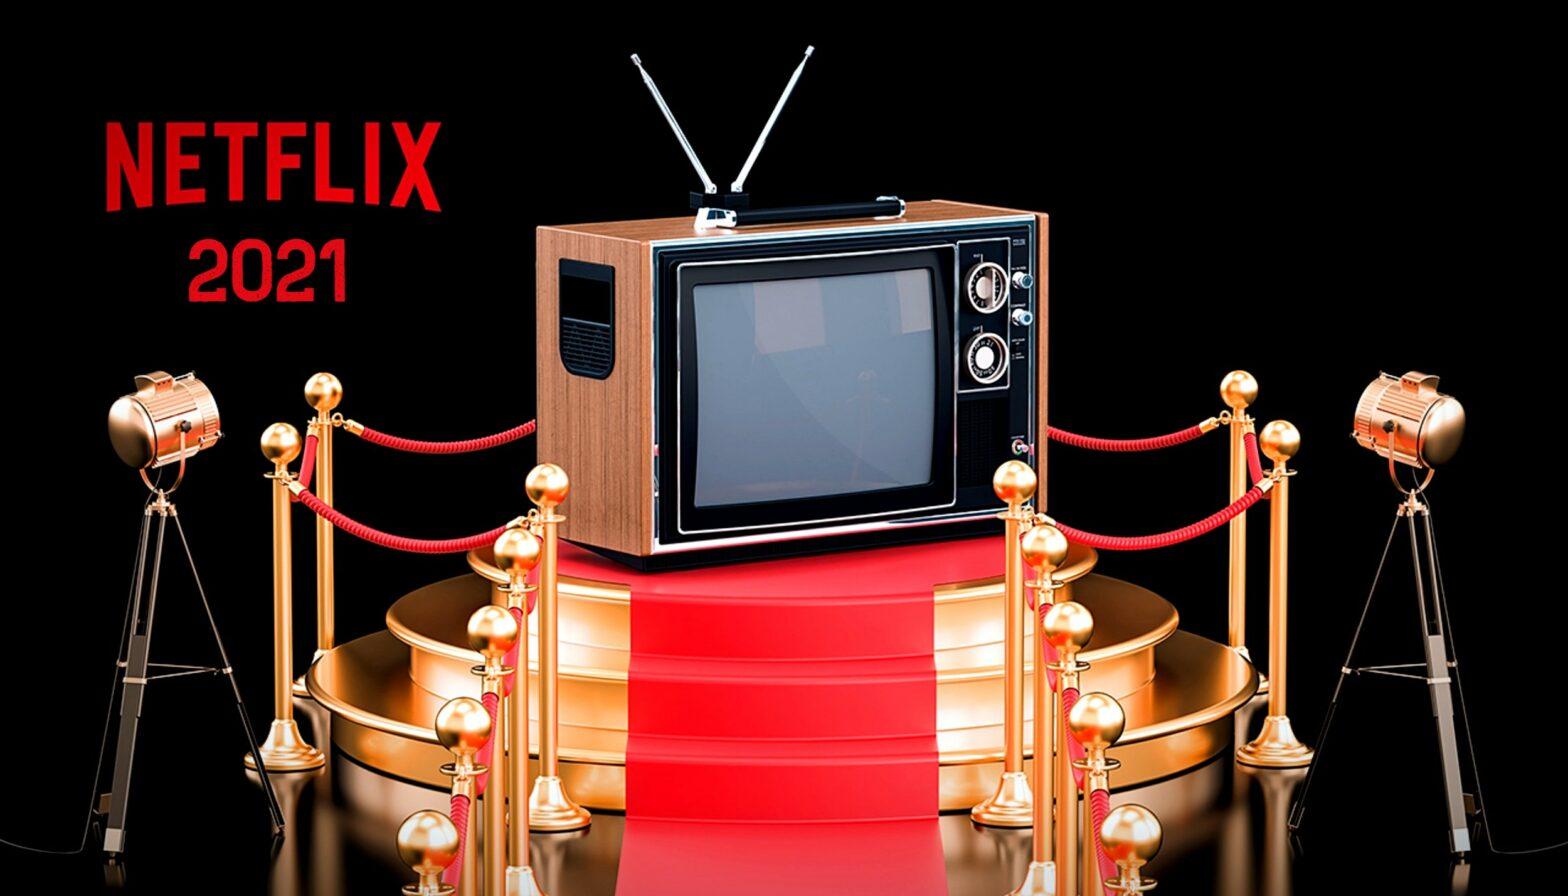 Meilleures séries Netflix 2021